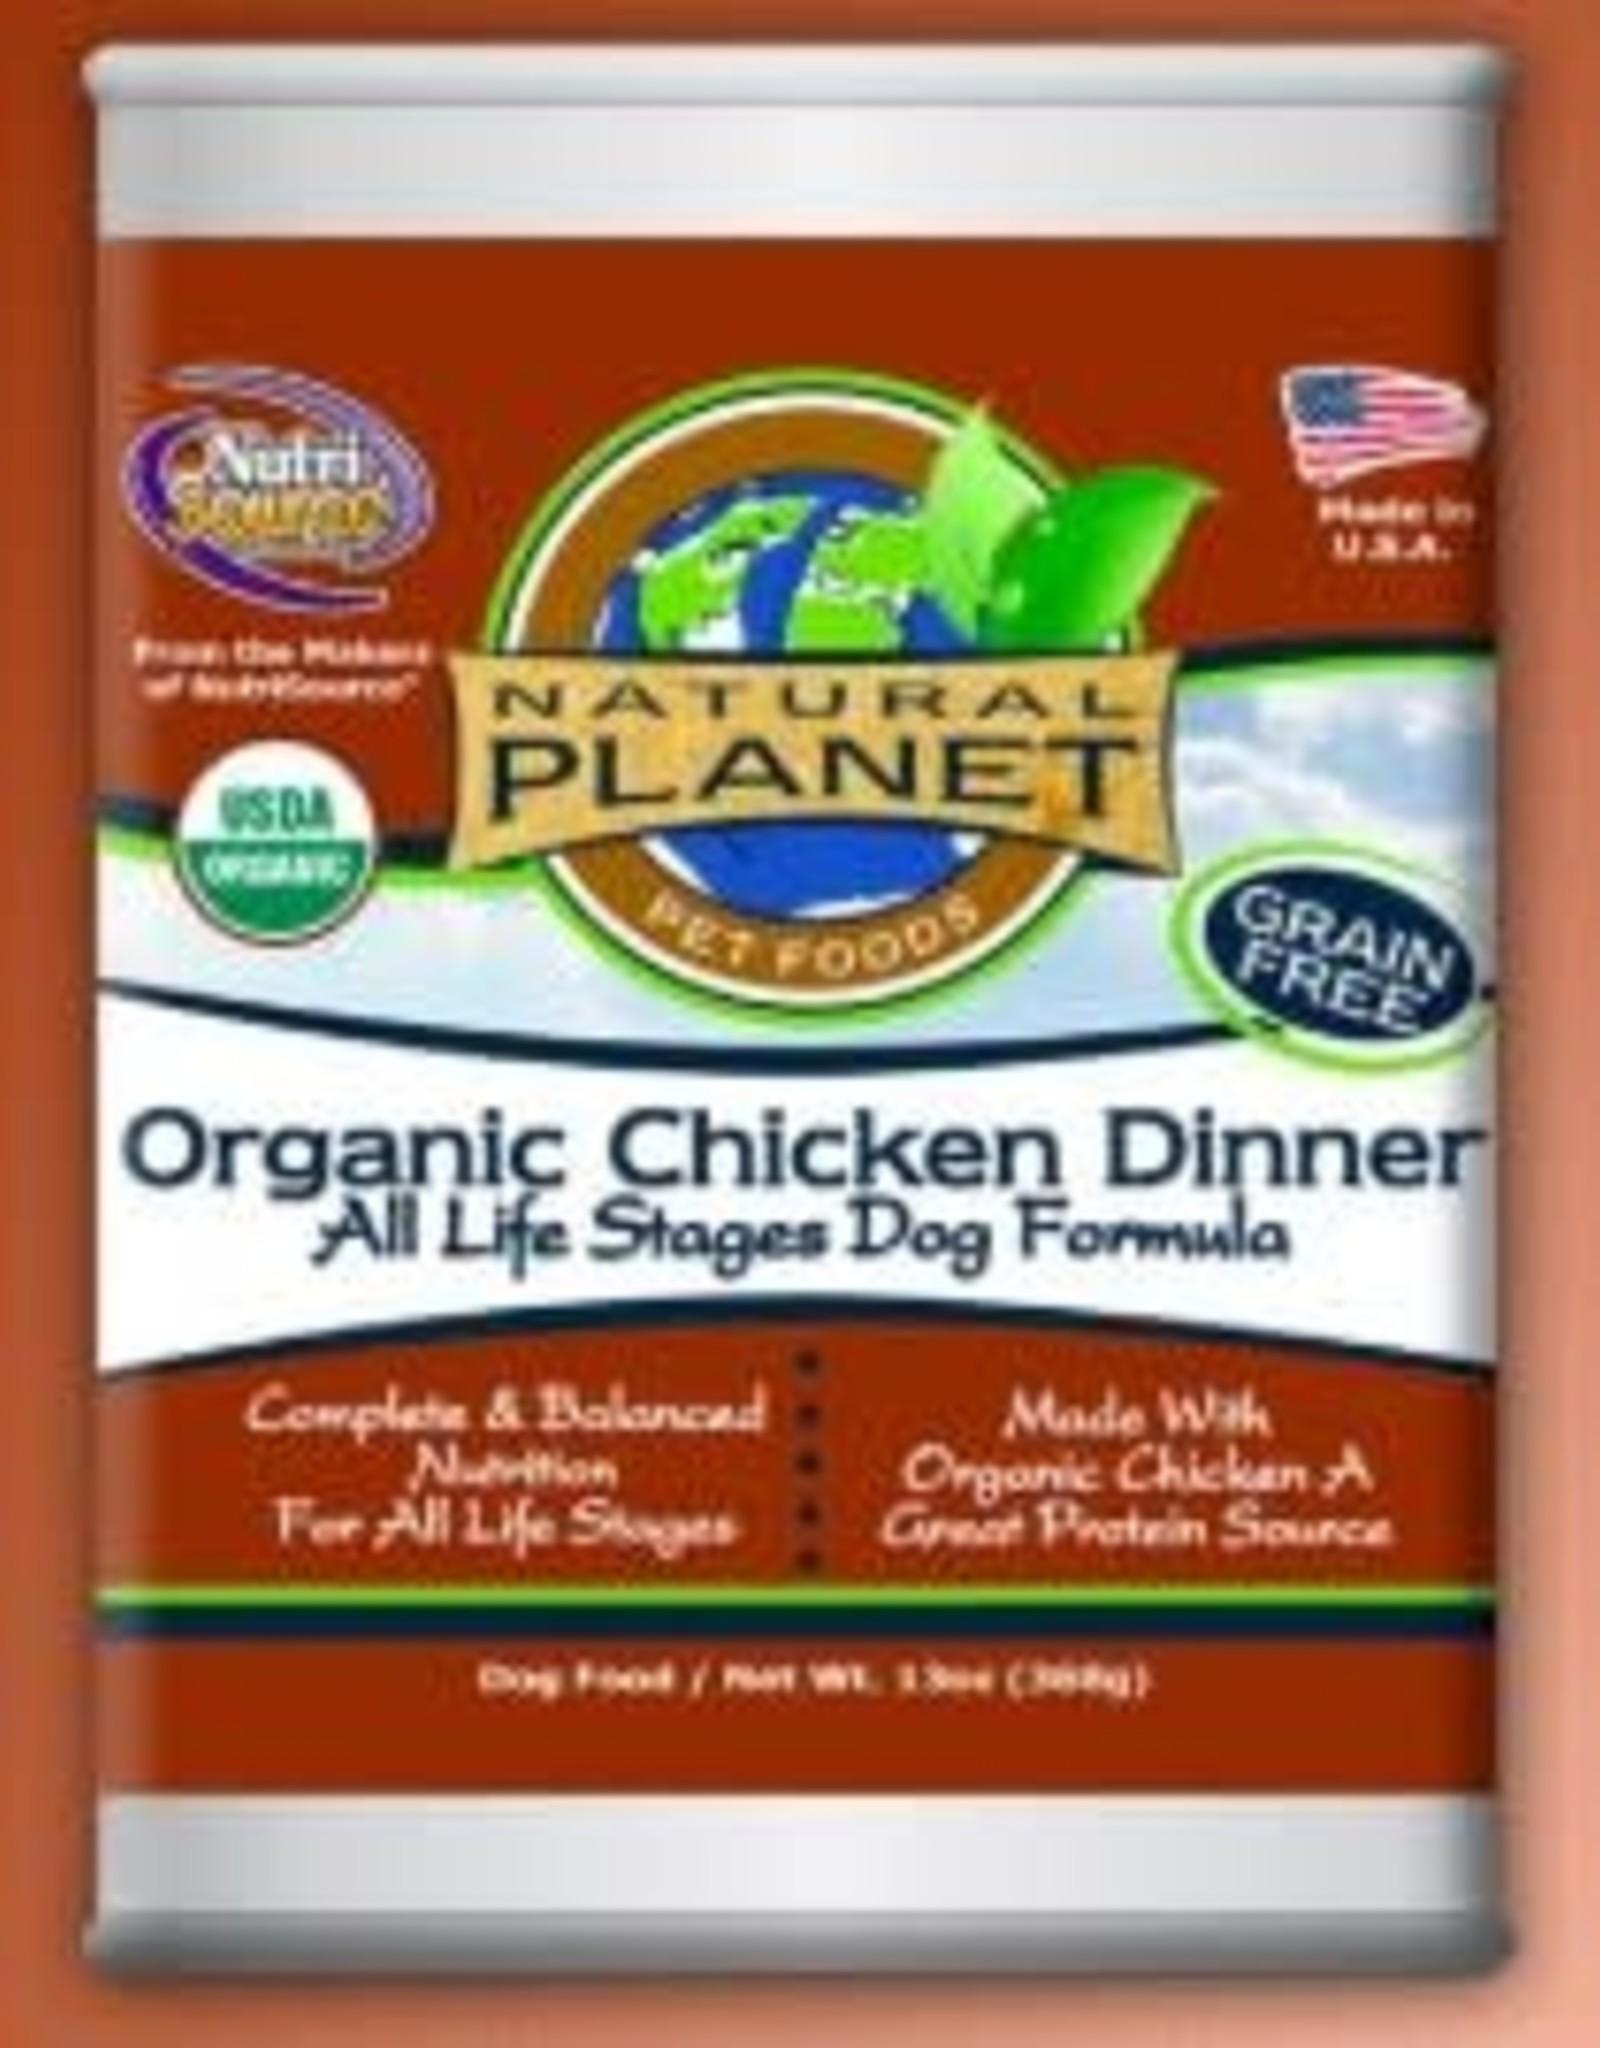 Natural Planet Organics Chicken Dinner Dog 13oz